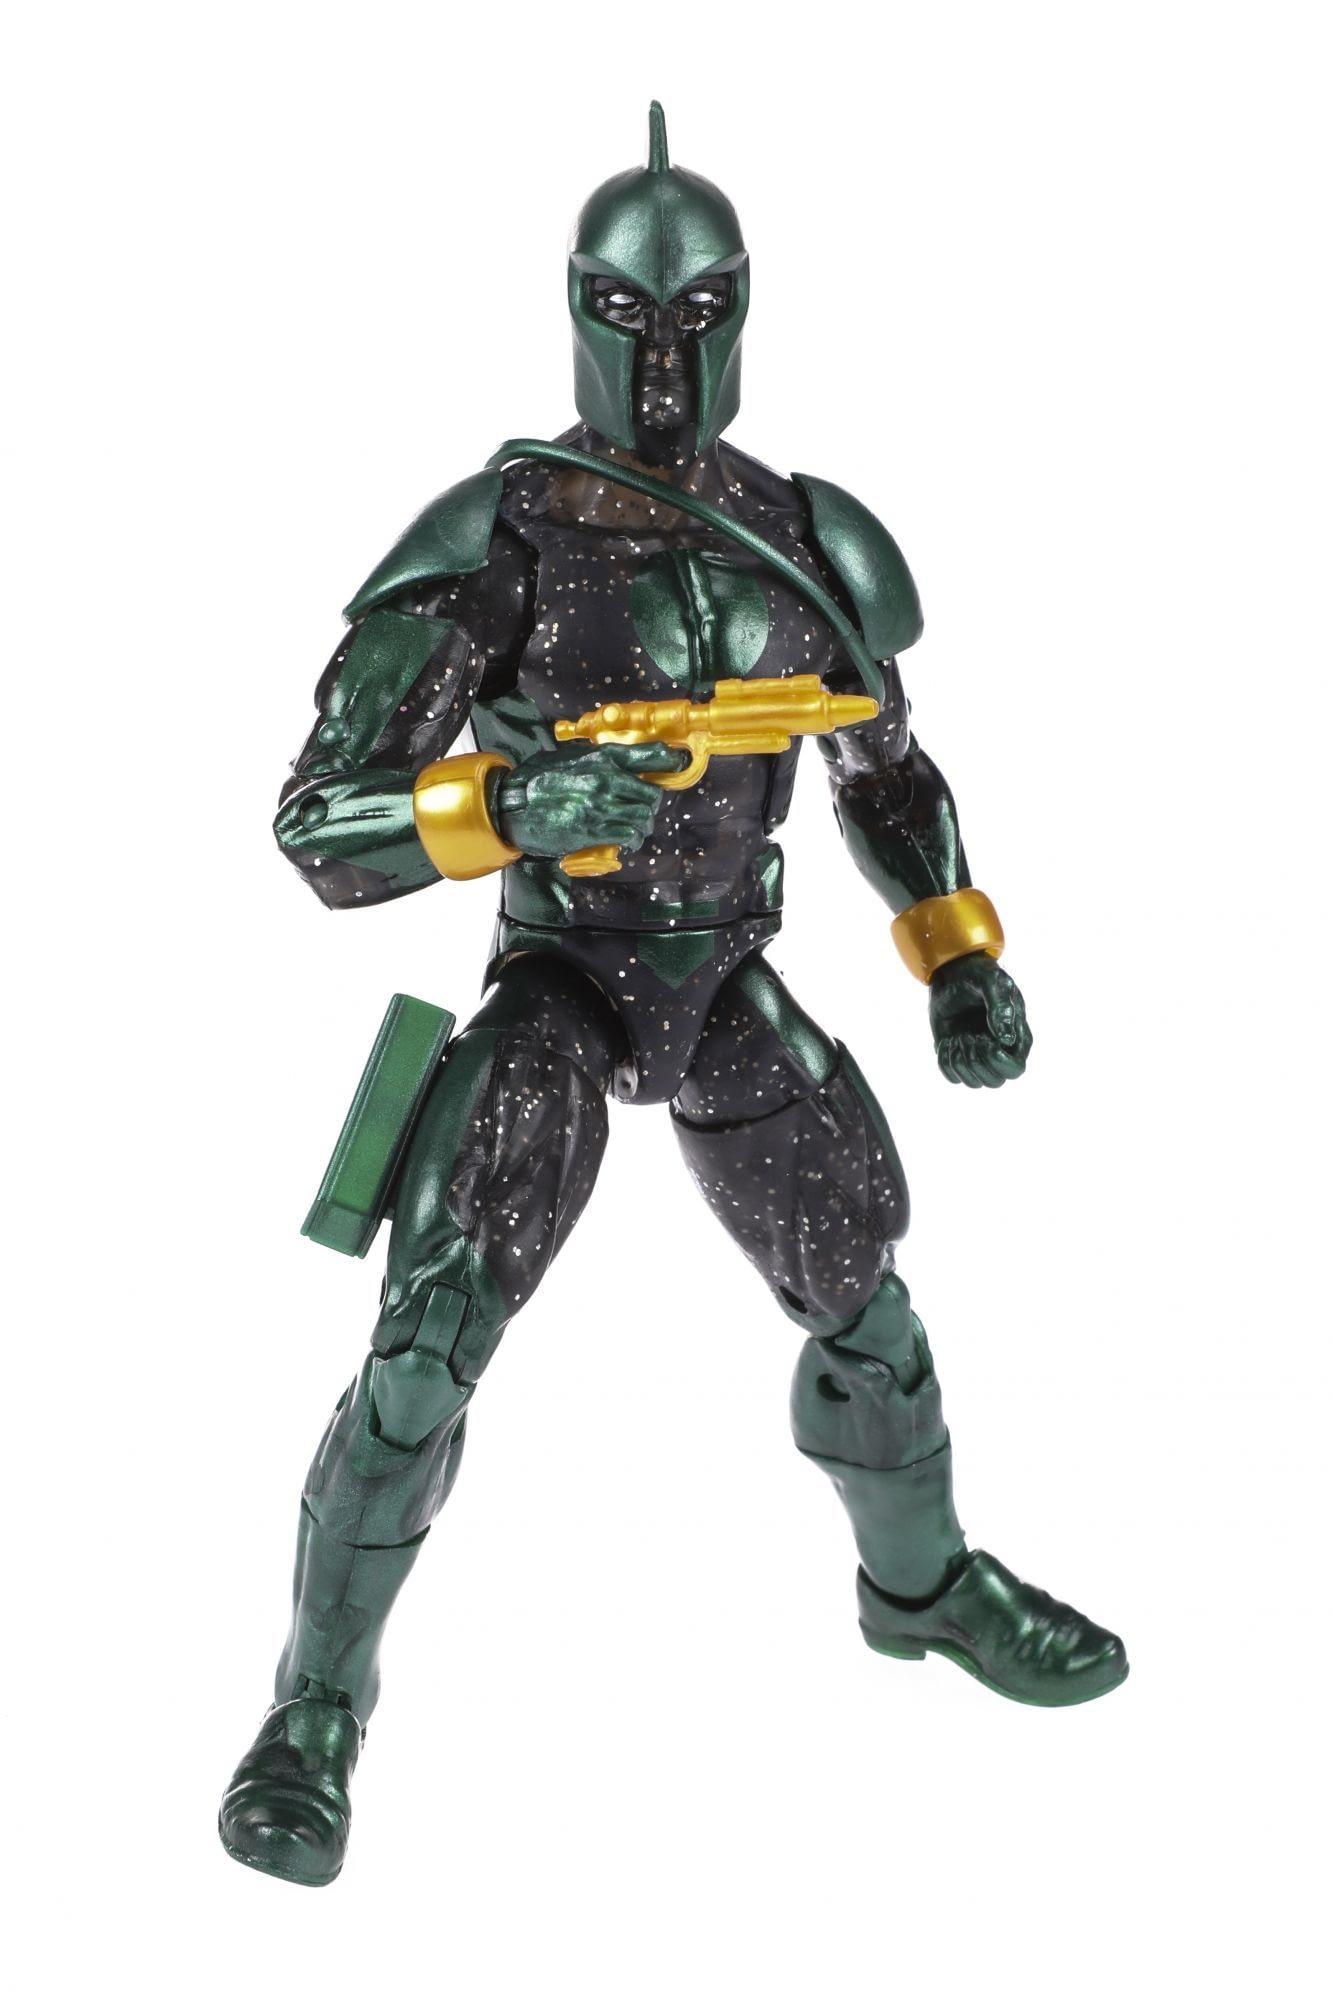 Marvel Legends Series 6-inch Genis-Vell Figure (Captain Marvel wave)